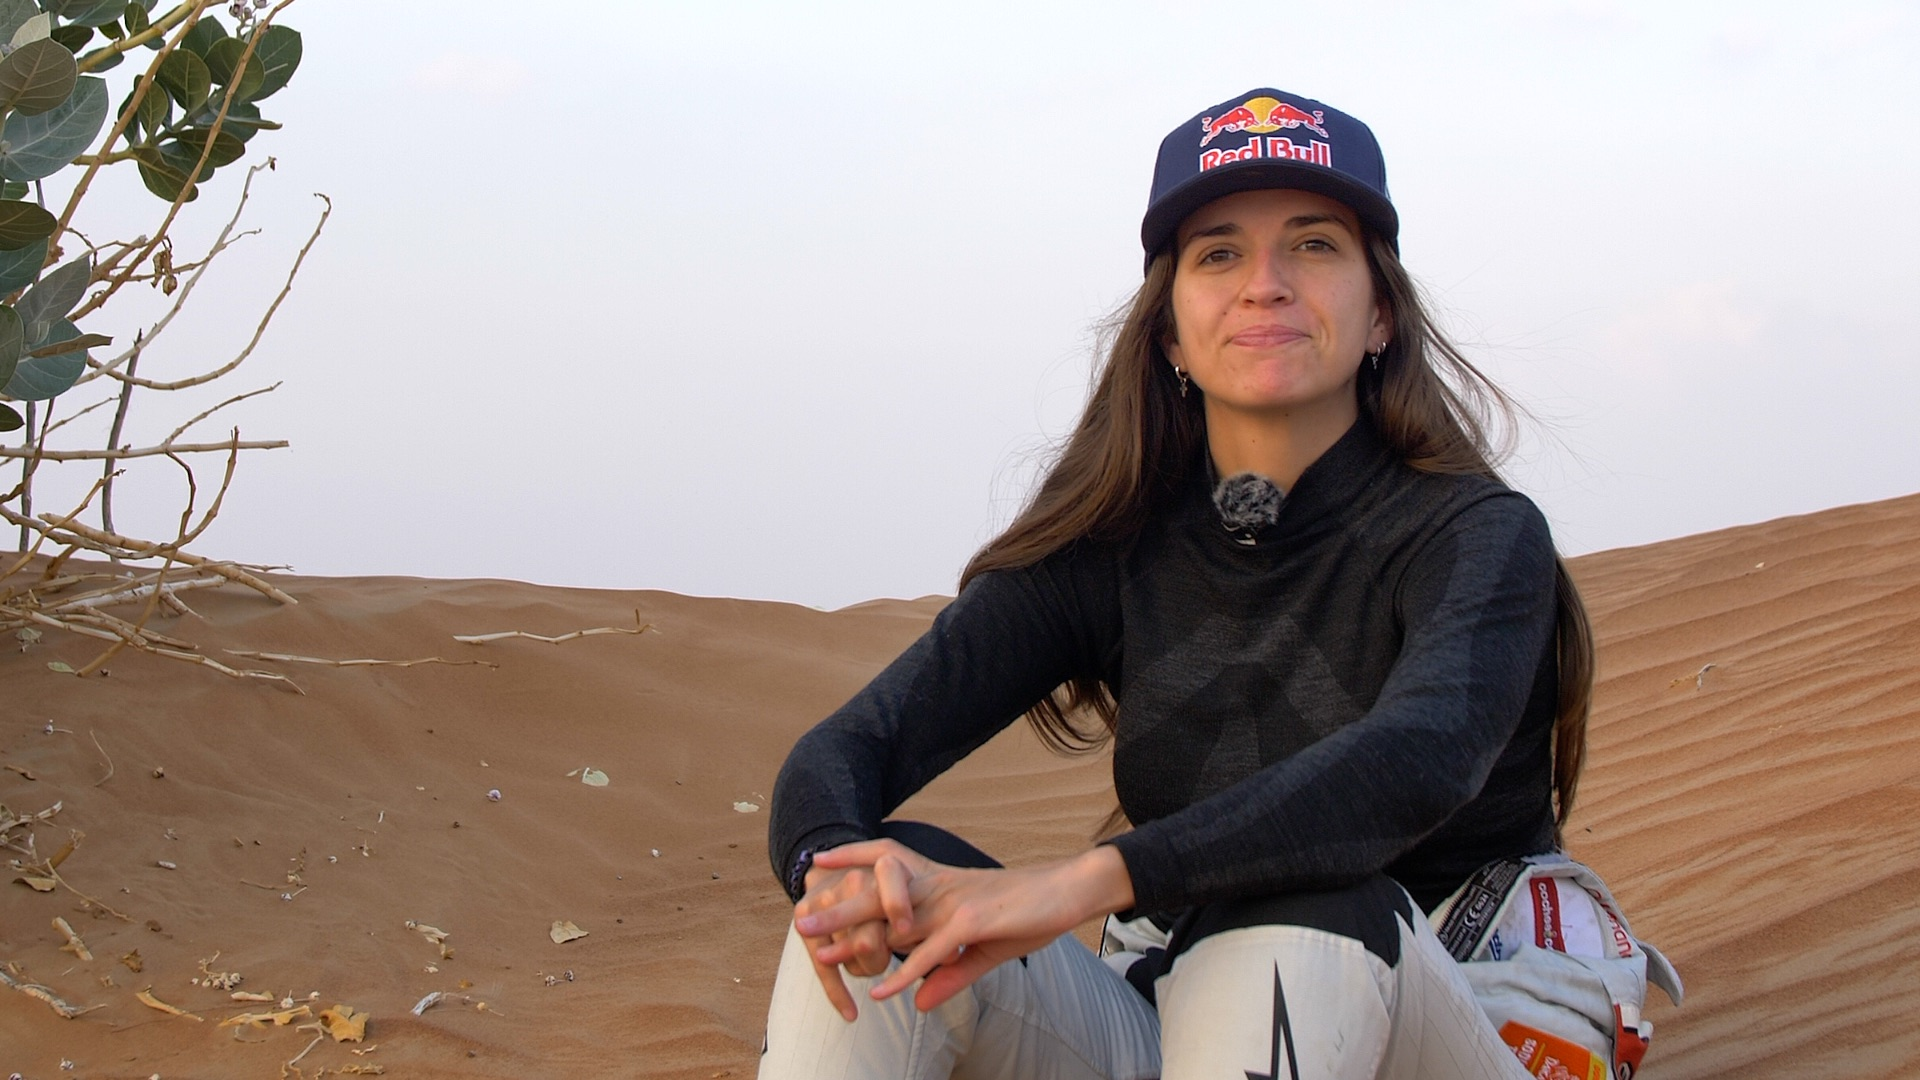 2021 43º Rallye Raid Dakar - Arabia Saudí [3-15 Enero] - Página 3 EpdCjQjXMAAGjod?format=jpg&name=large